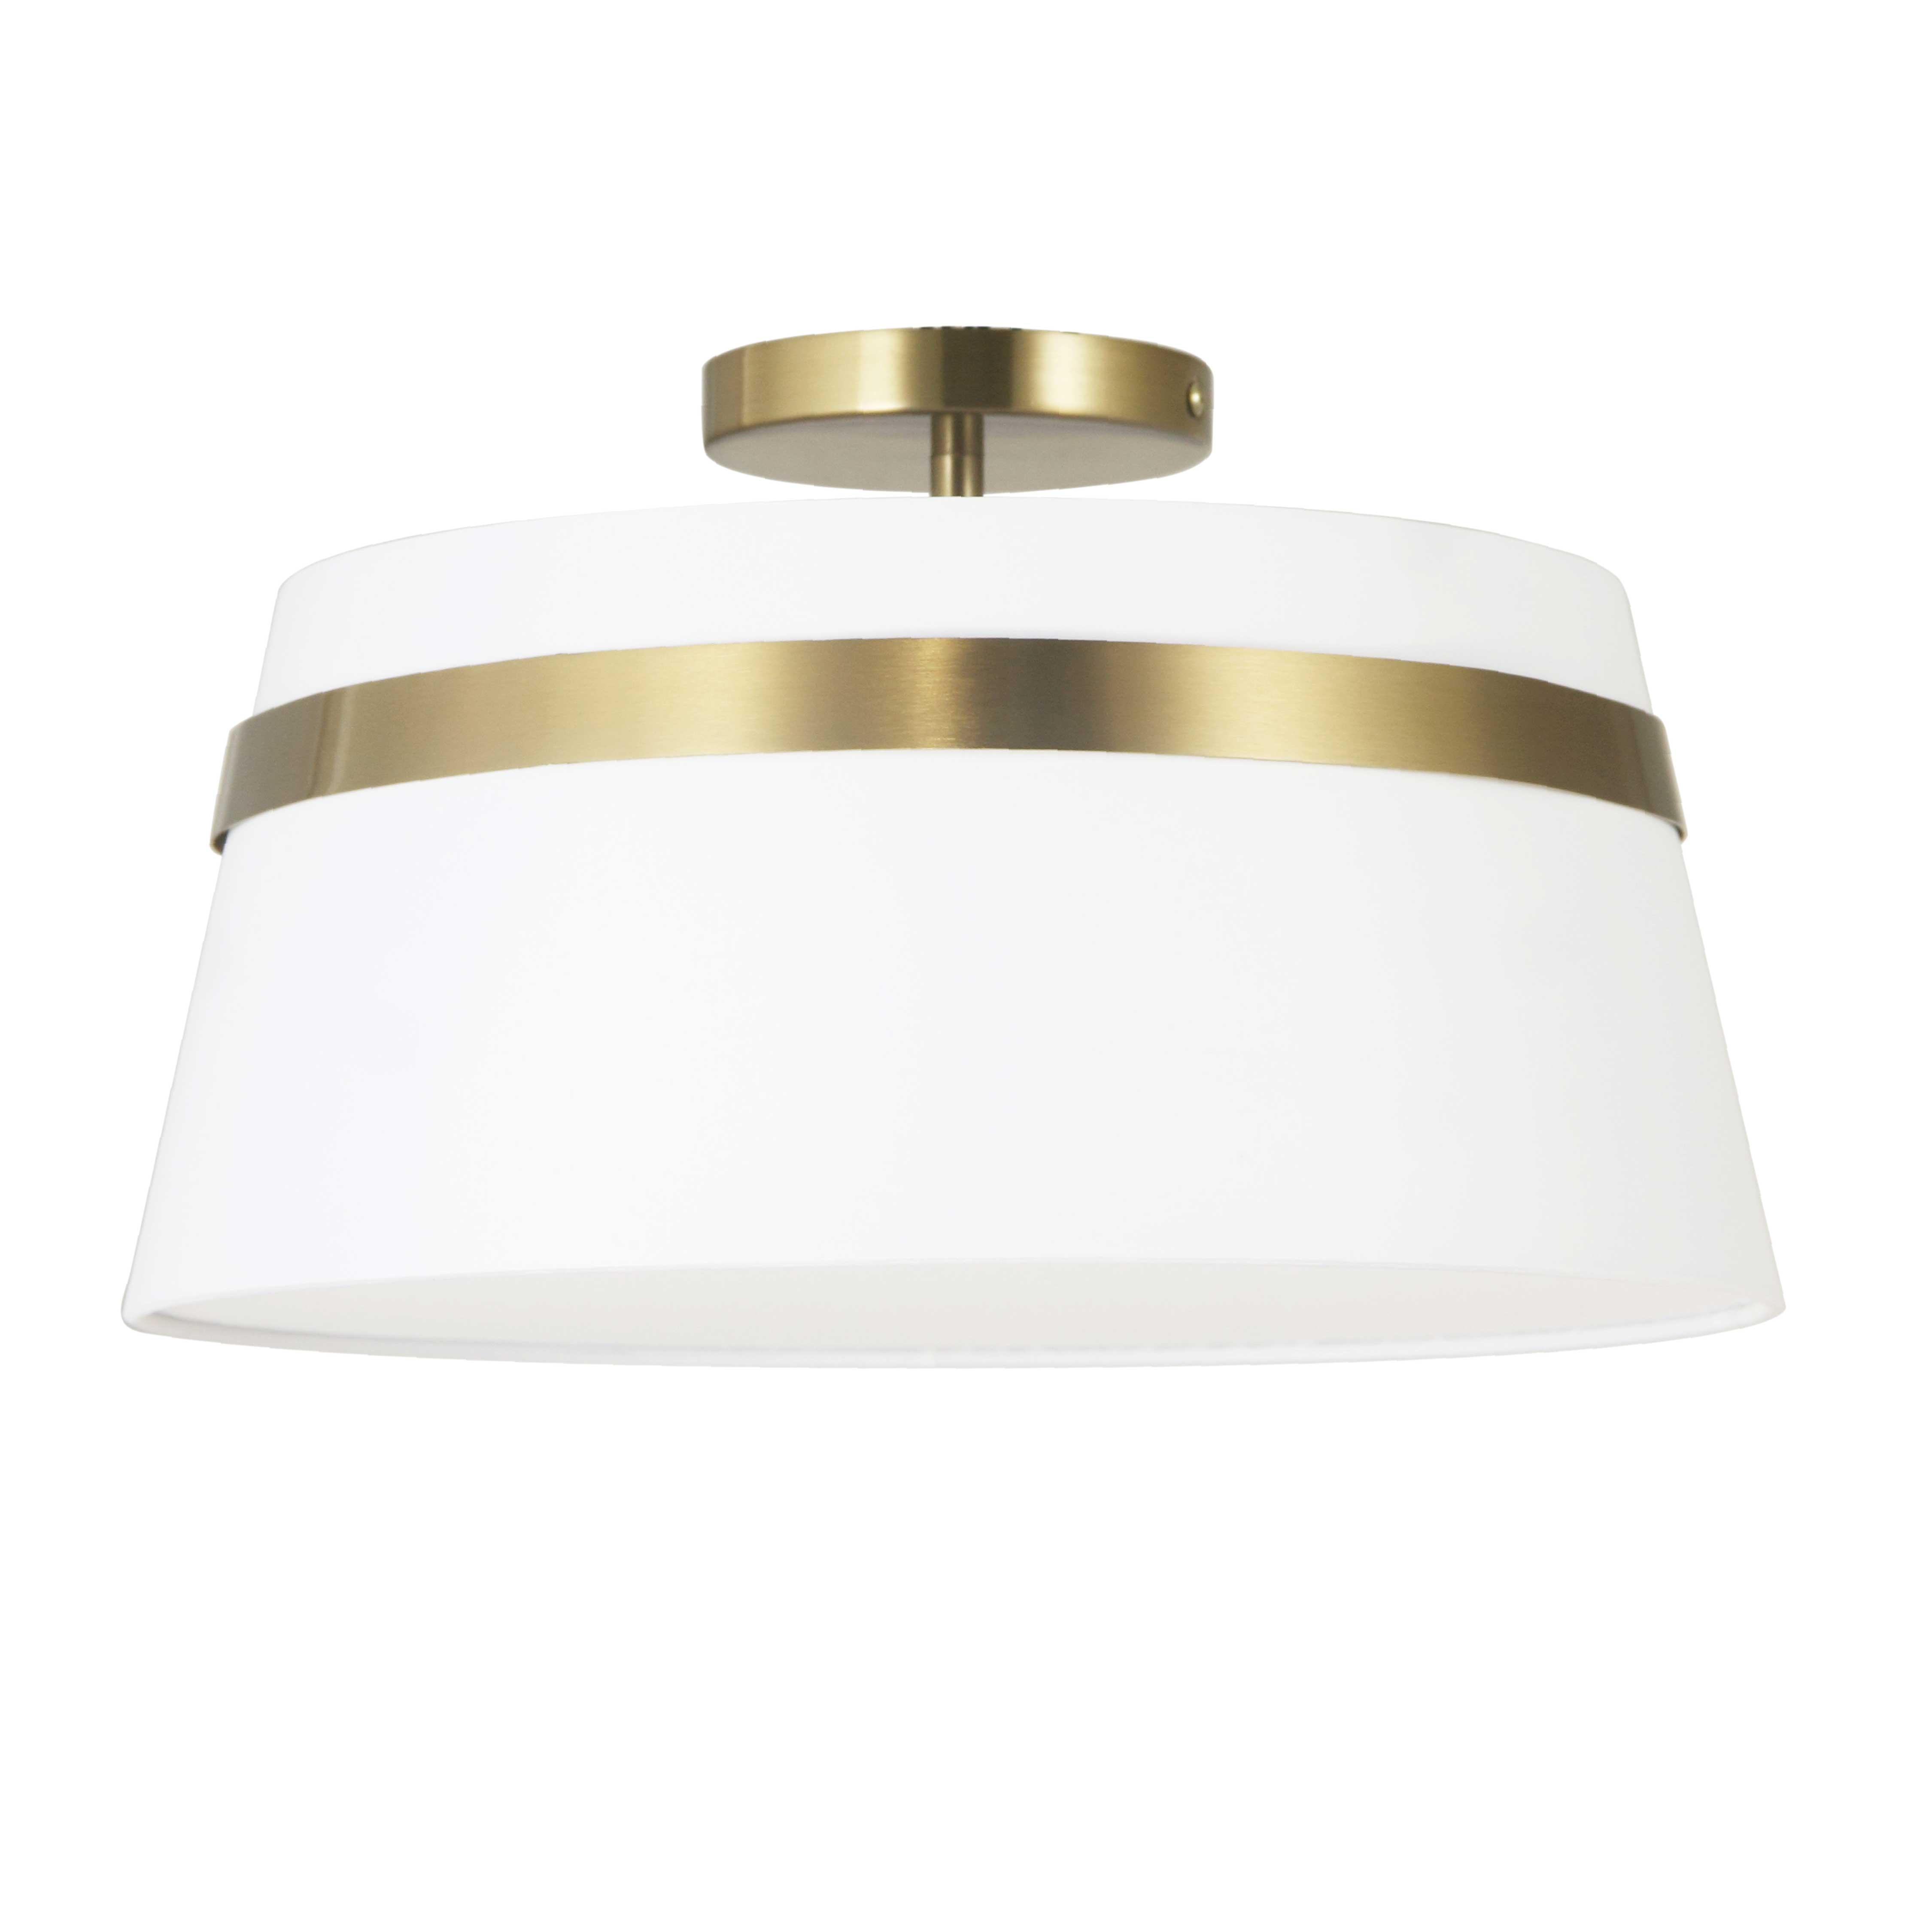 3 Light Incandescent Aged Brass Semi-Flush Mount w/ White Shade